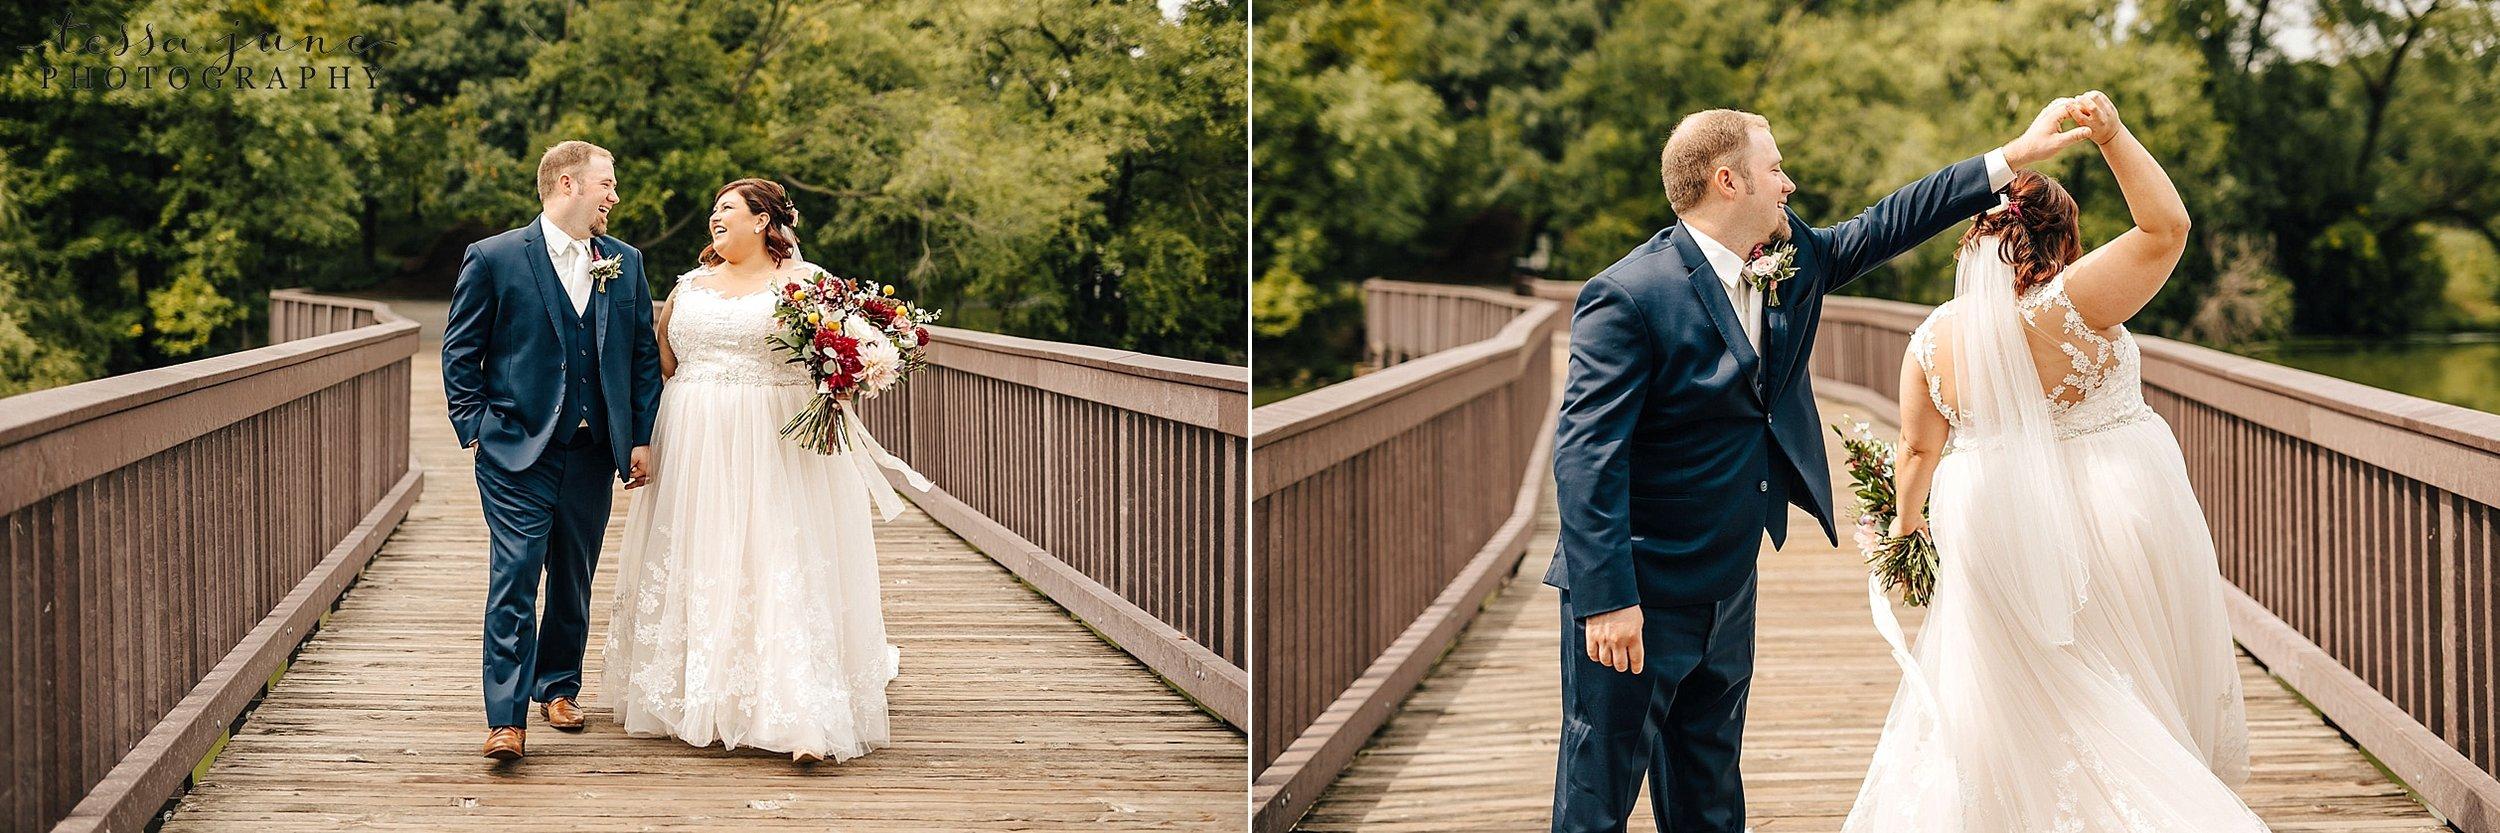 minneapolis-summer-wedding-at-silverwood-park-pristine-floral-48.jpg